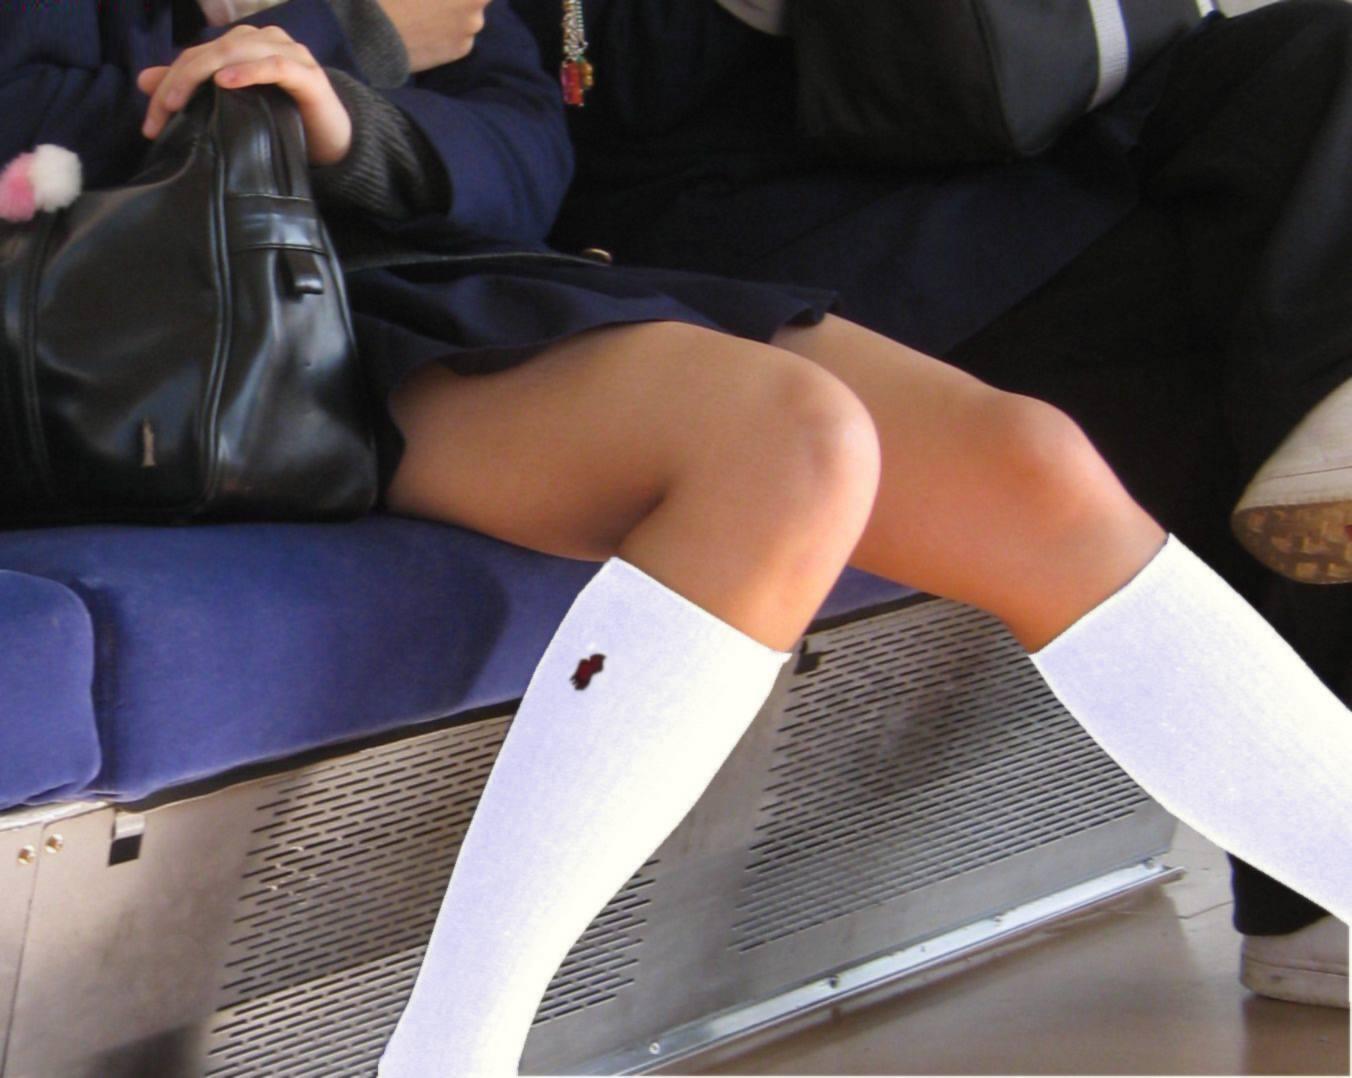 【JK街撮り】ムッチリとはまた違う色香wwwポ○キーみたいな細脚のJKたち 20